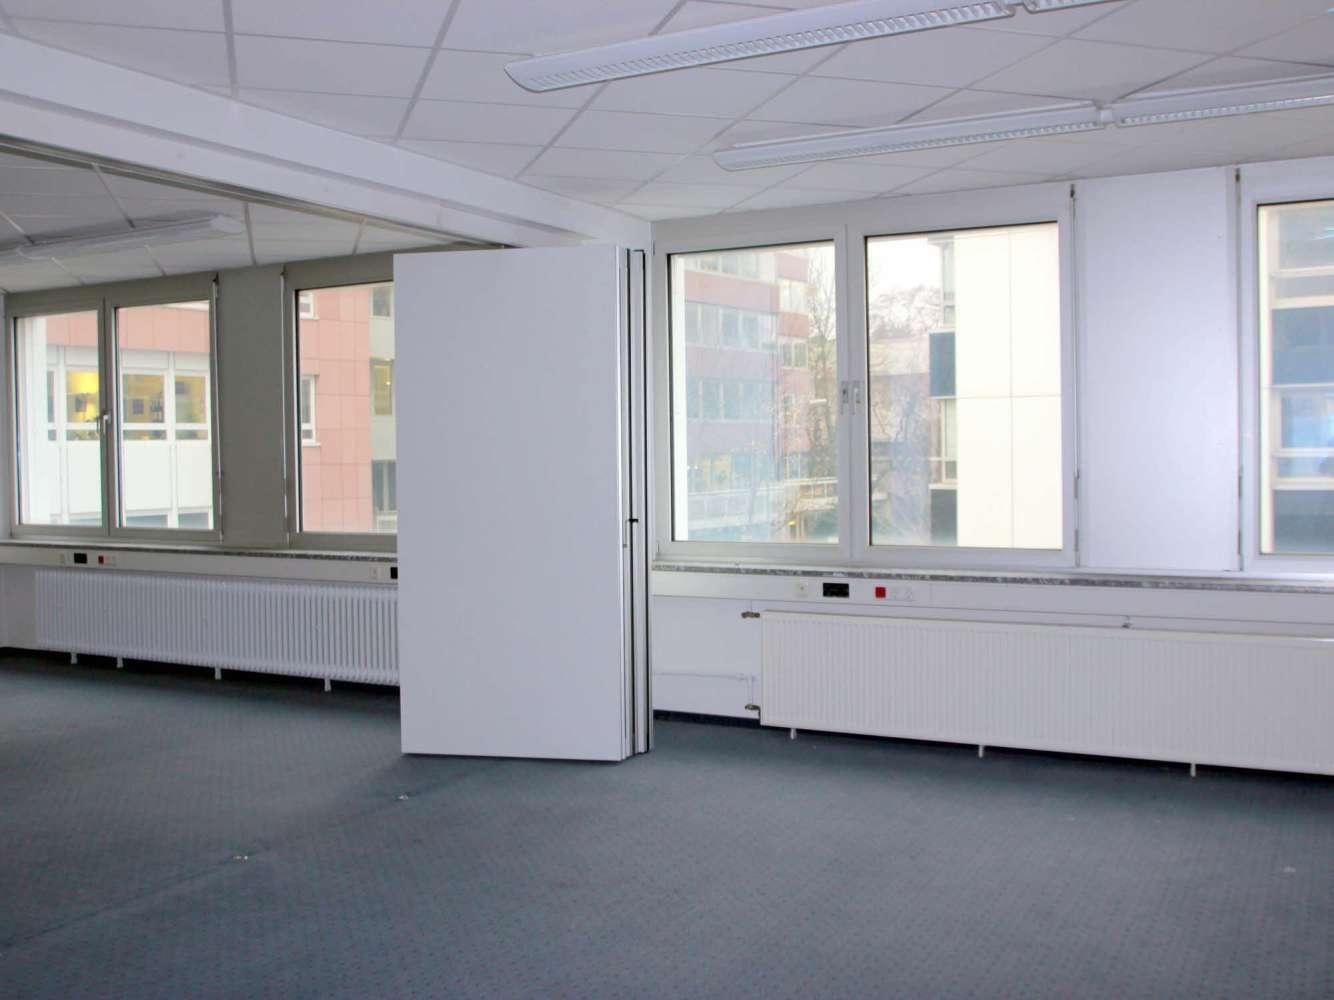 Büros Frankfurt am main, 60599 - Büro - Frankfurt am Main, Sachsenhausen - F1435 - 9529280